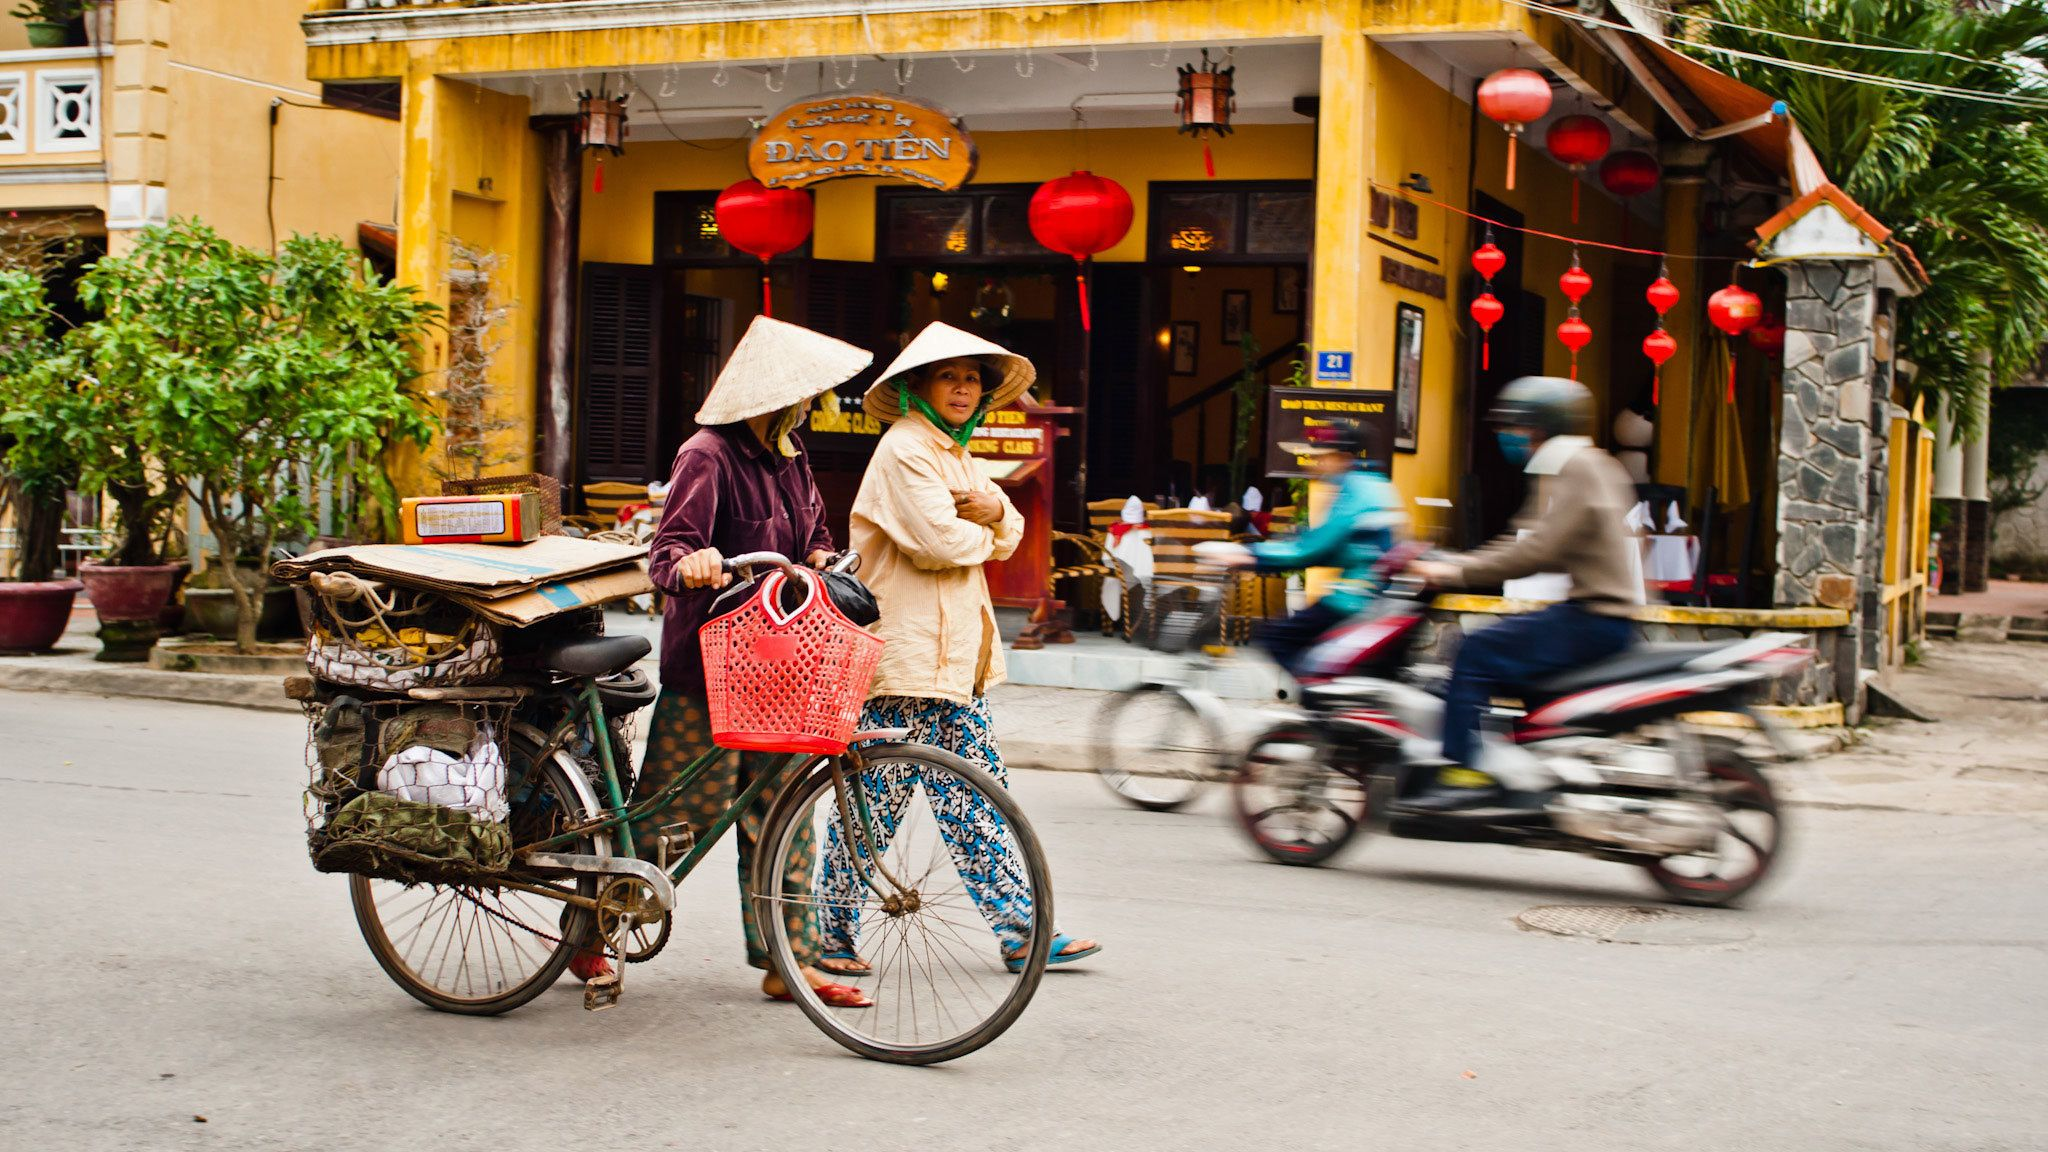 bikes on city street